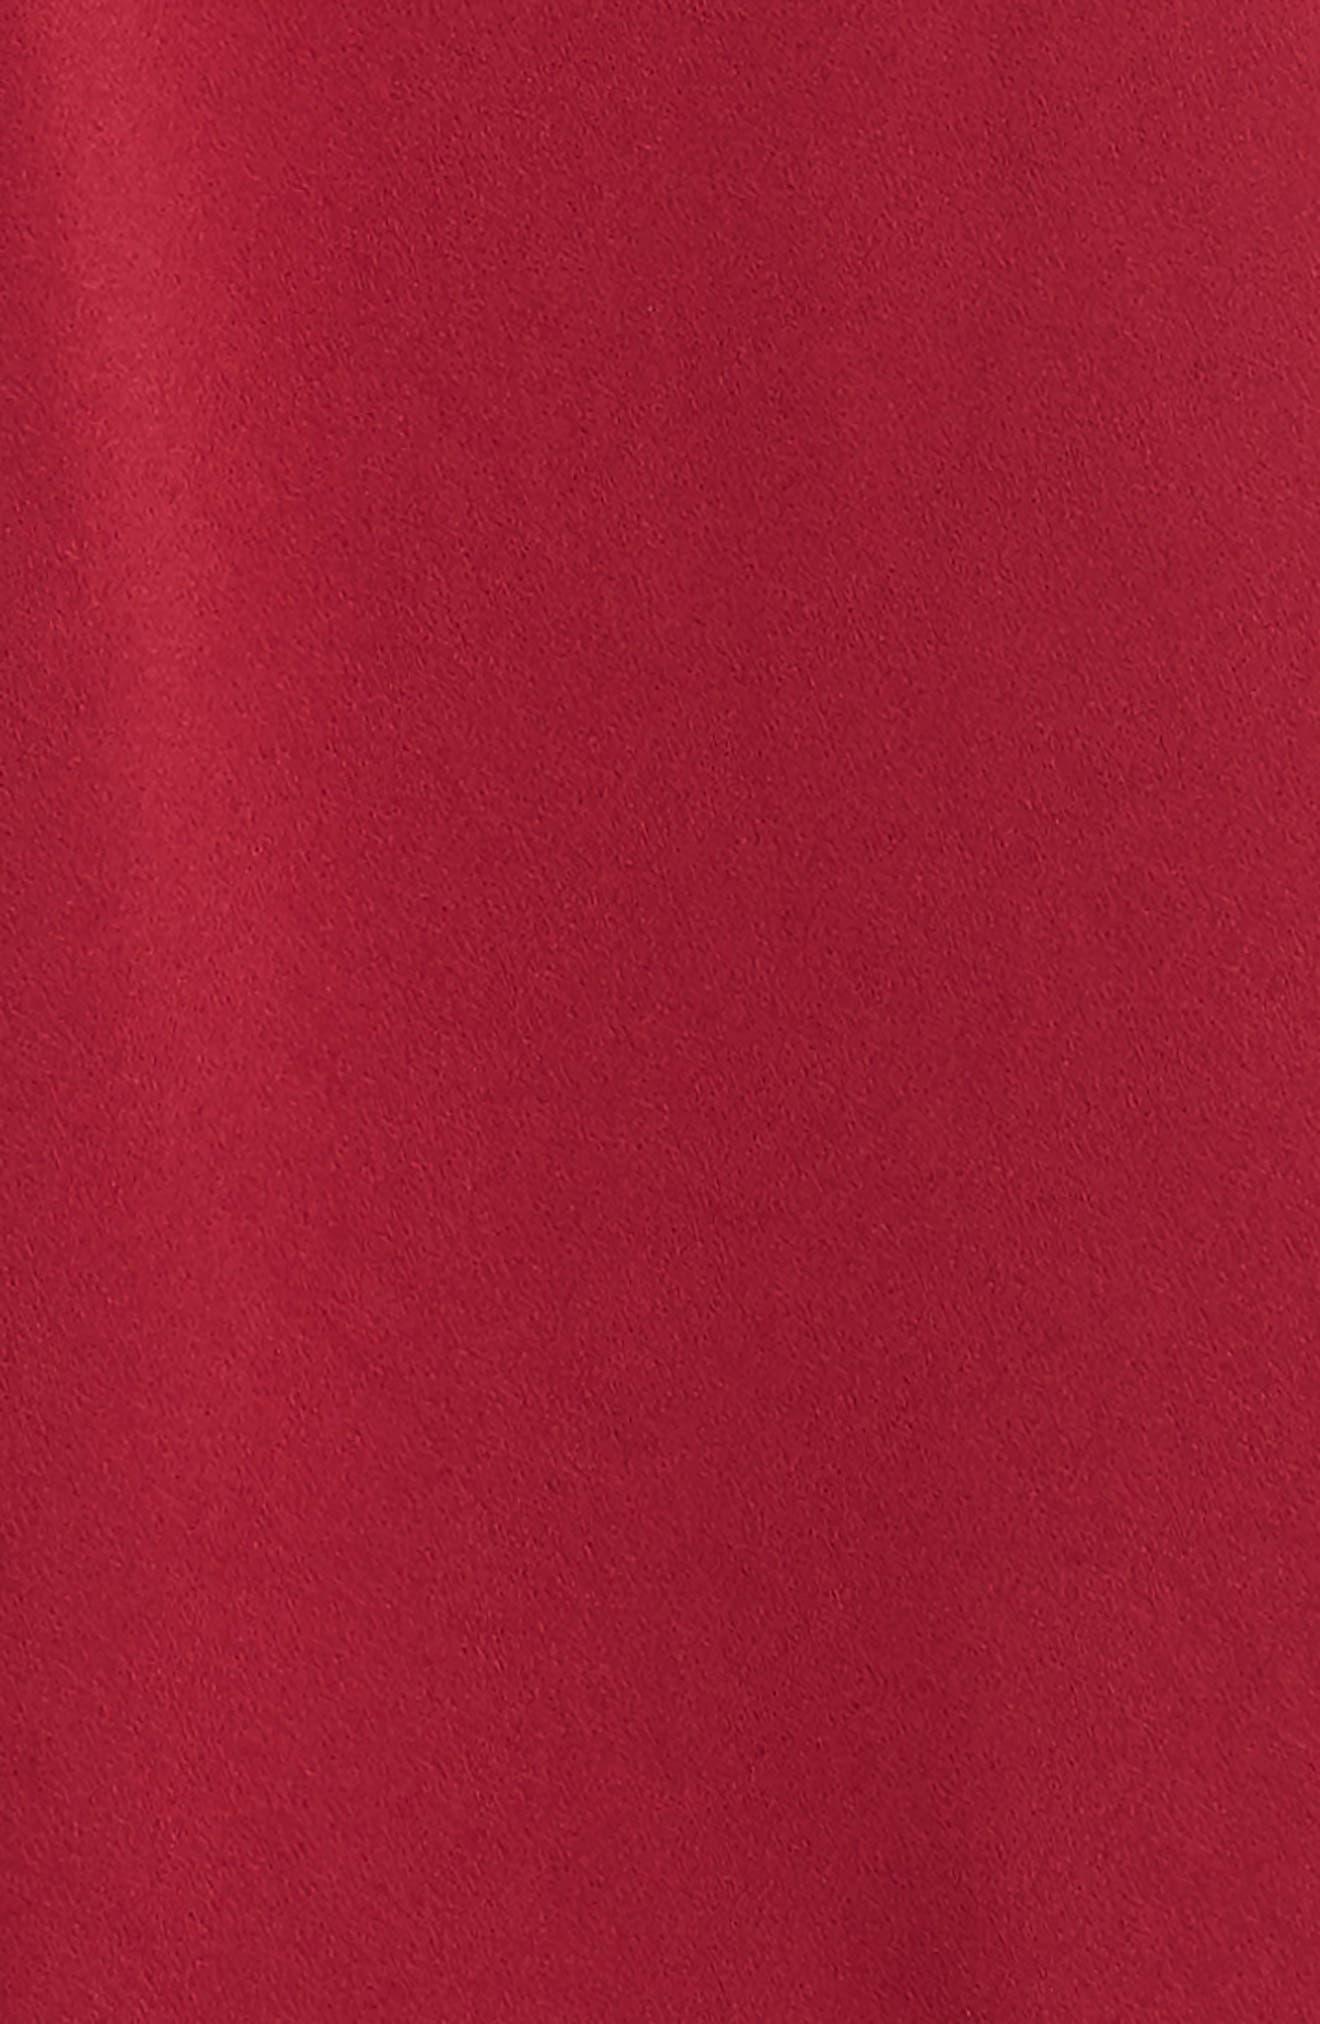 Point Collar Dress,                             Alternate thumbnail 3, color,